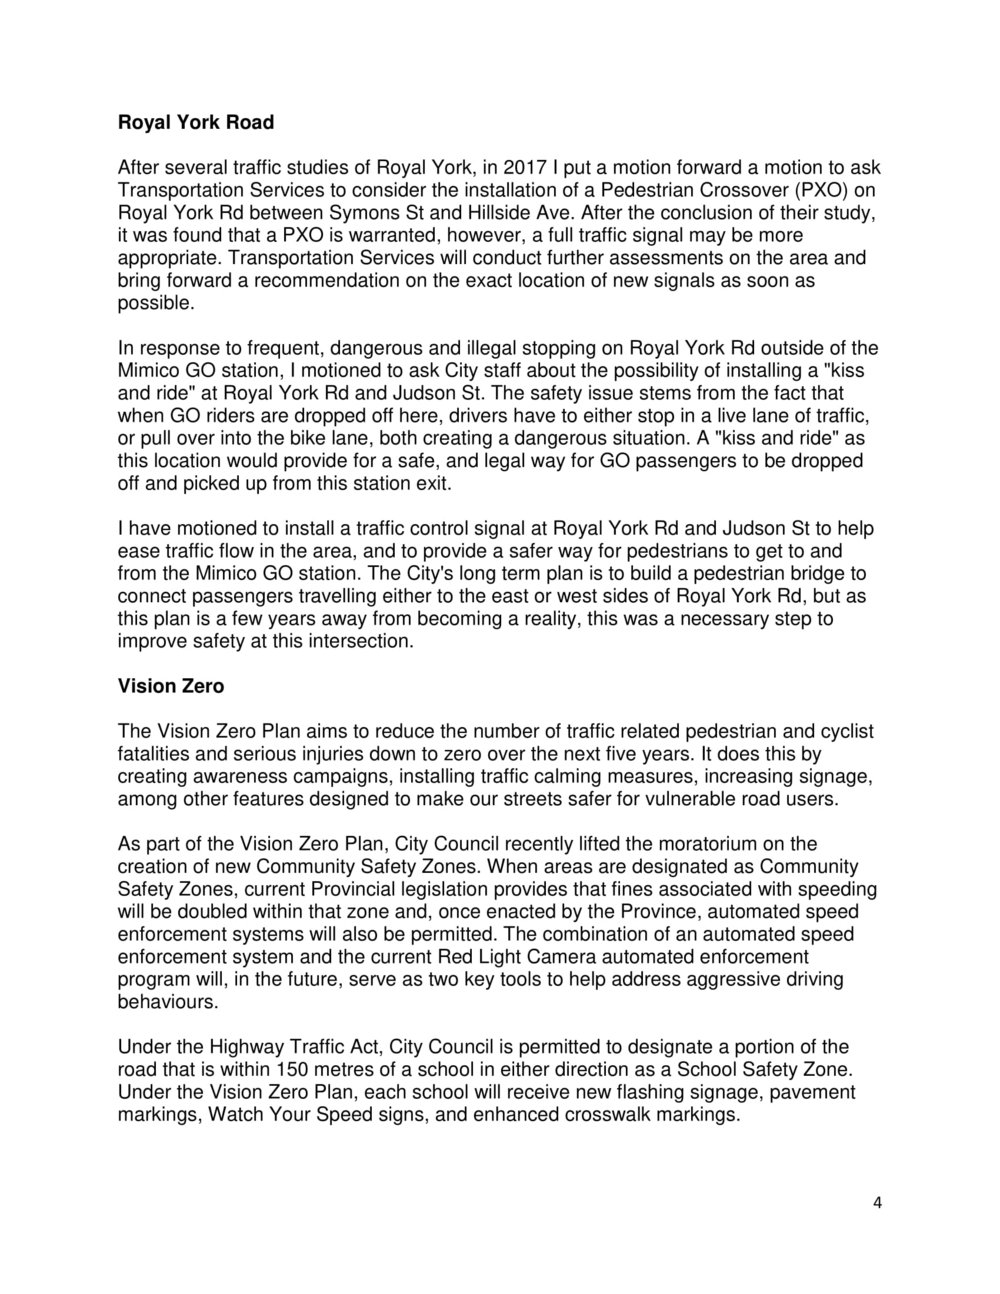 Response to MRA FINAL-4.jpg